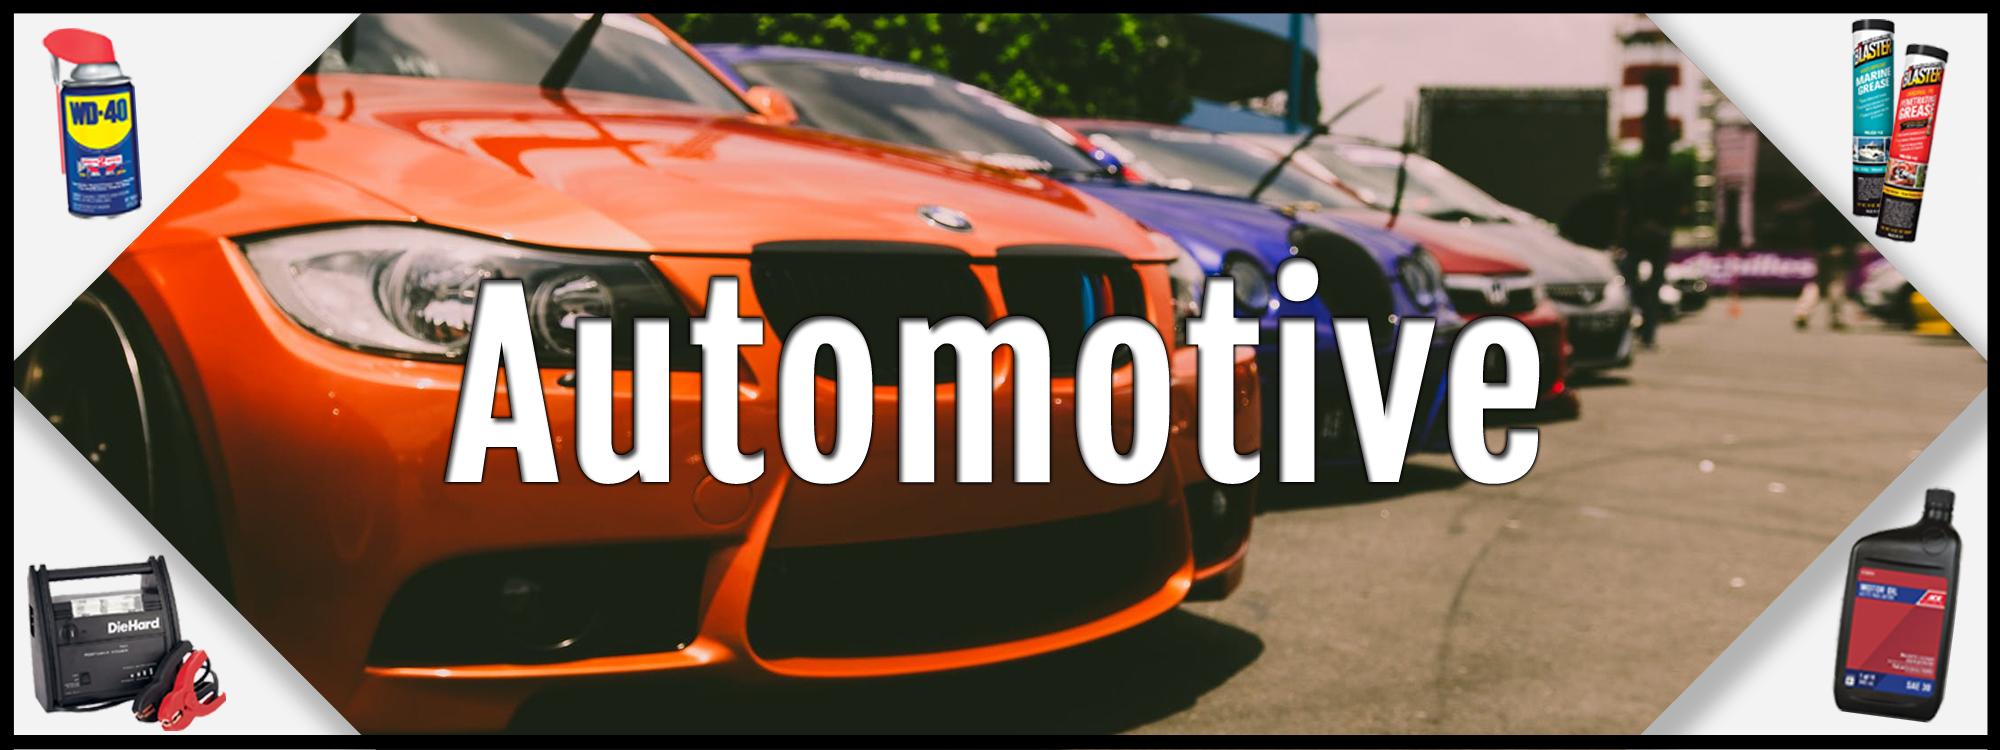 new automotive banner copy.jpg